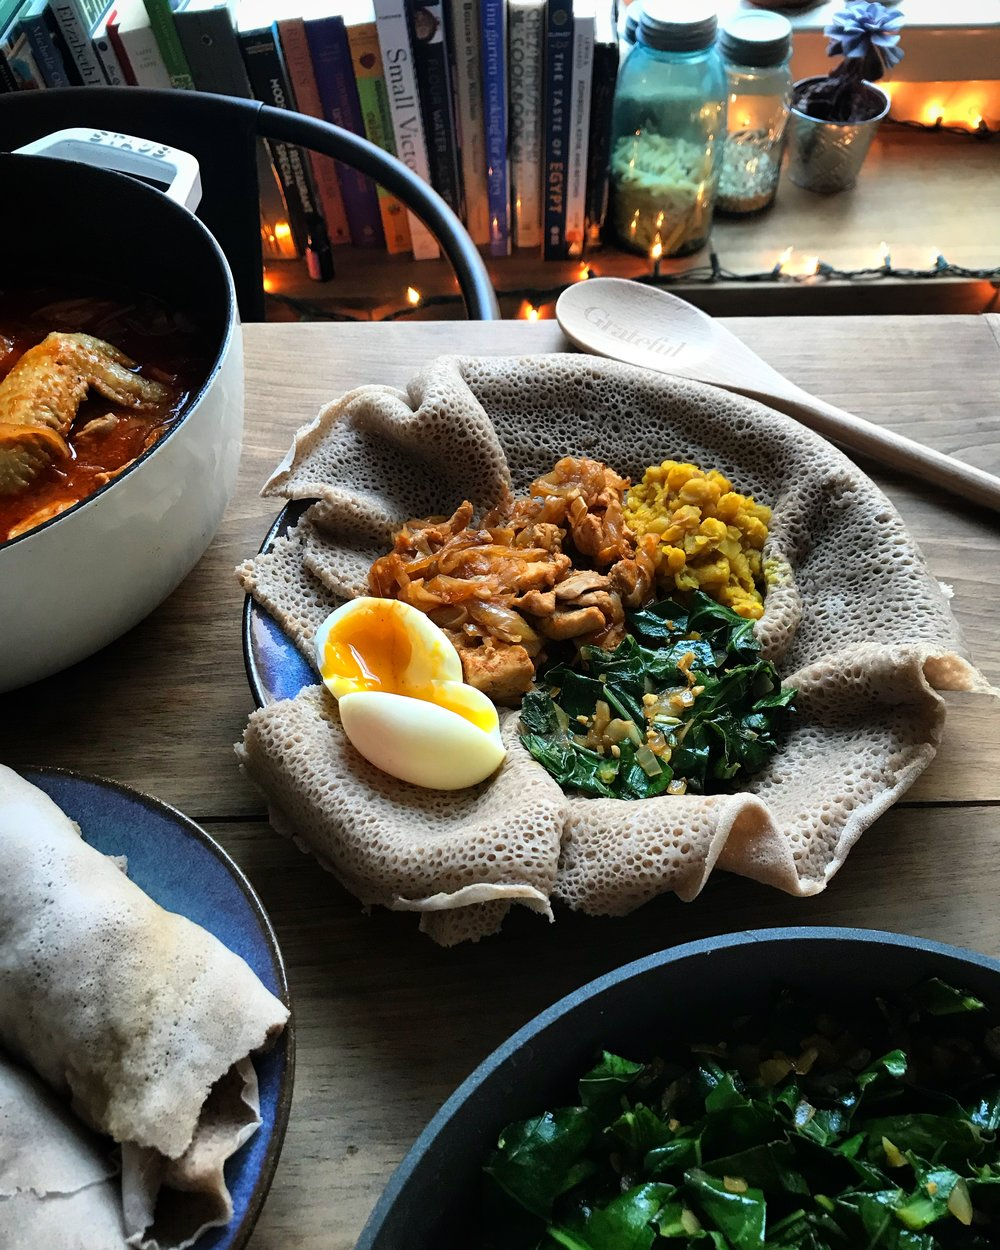 doro wat injera yellow split peas ethiopian meal ingredients